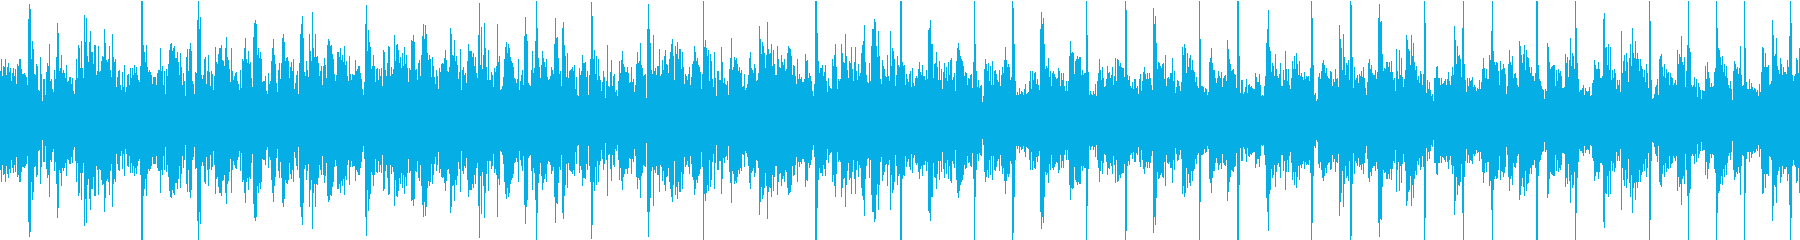 70sグラムロック風BGM ループ仕様の再生済みの波形